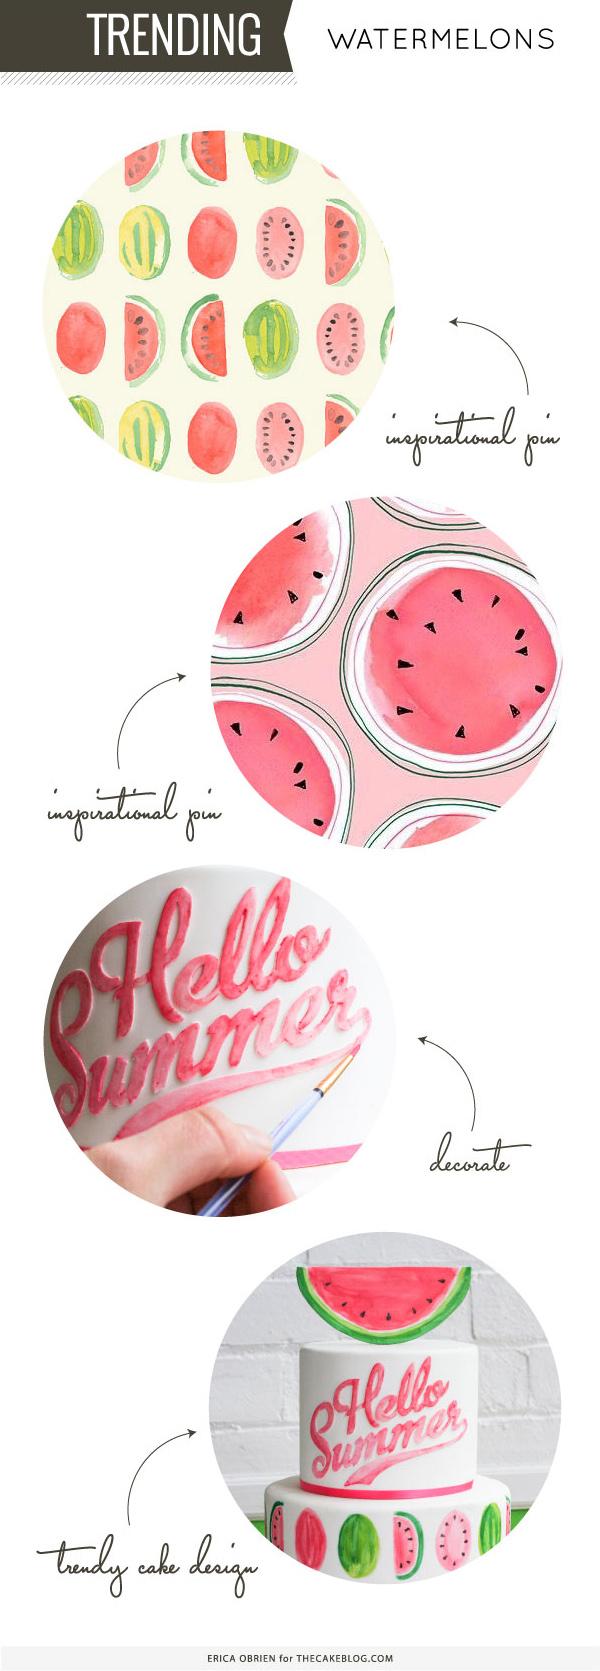 Watermelon Cake Inspiration | by Erica OBrien for TheCakeBlog.com